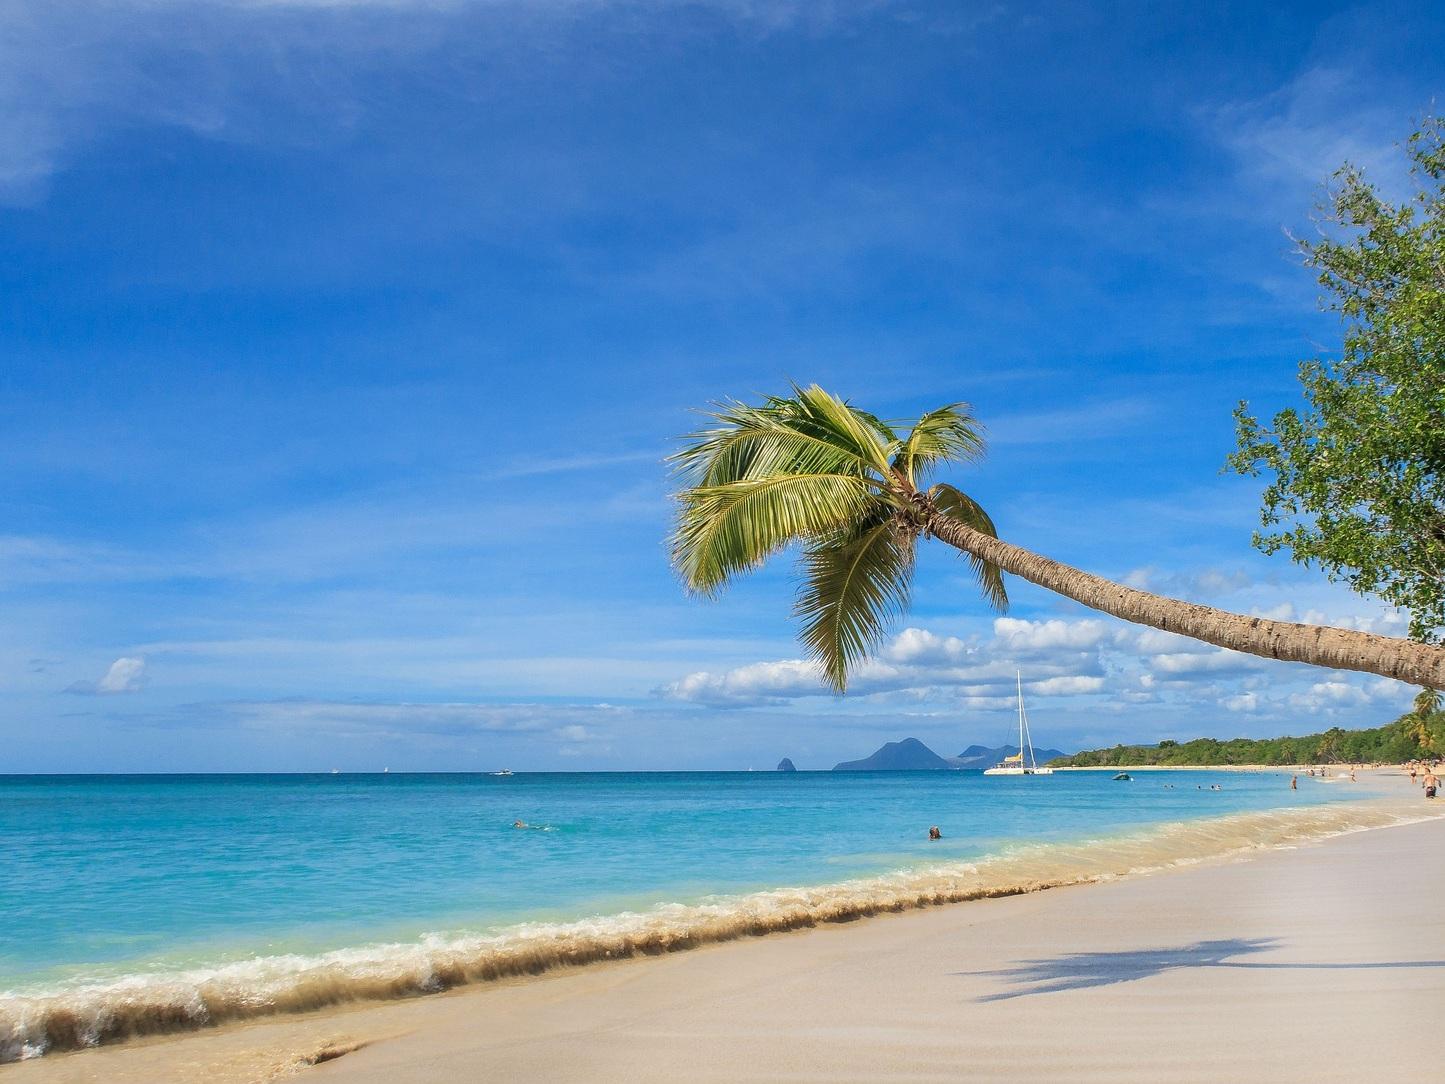 Martinique, October 2019 - DIVERSITY + TOGETHERNESS